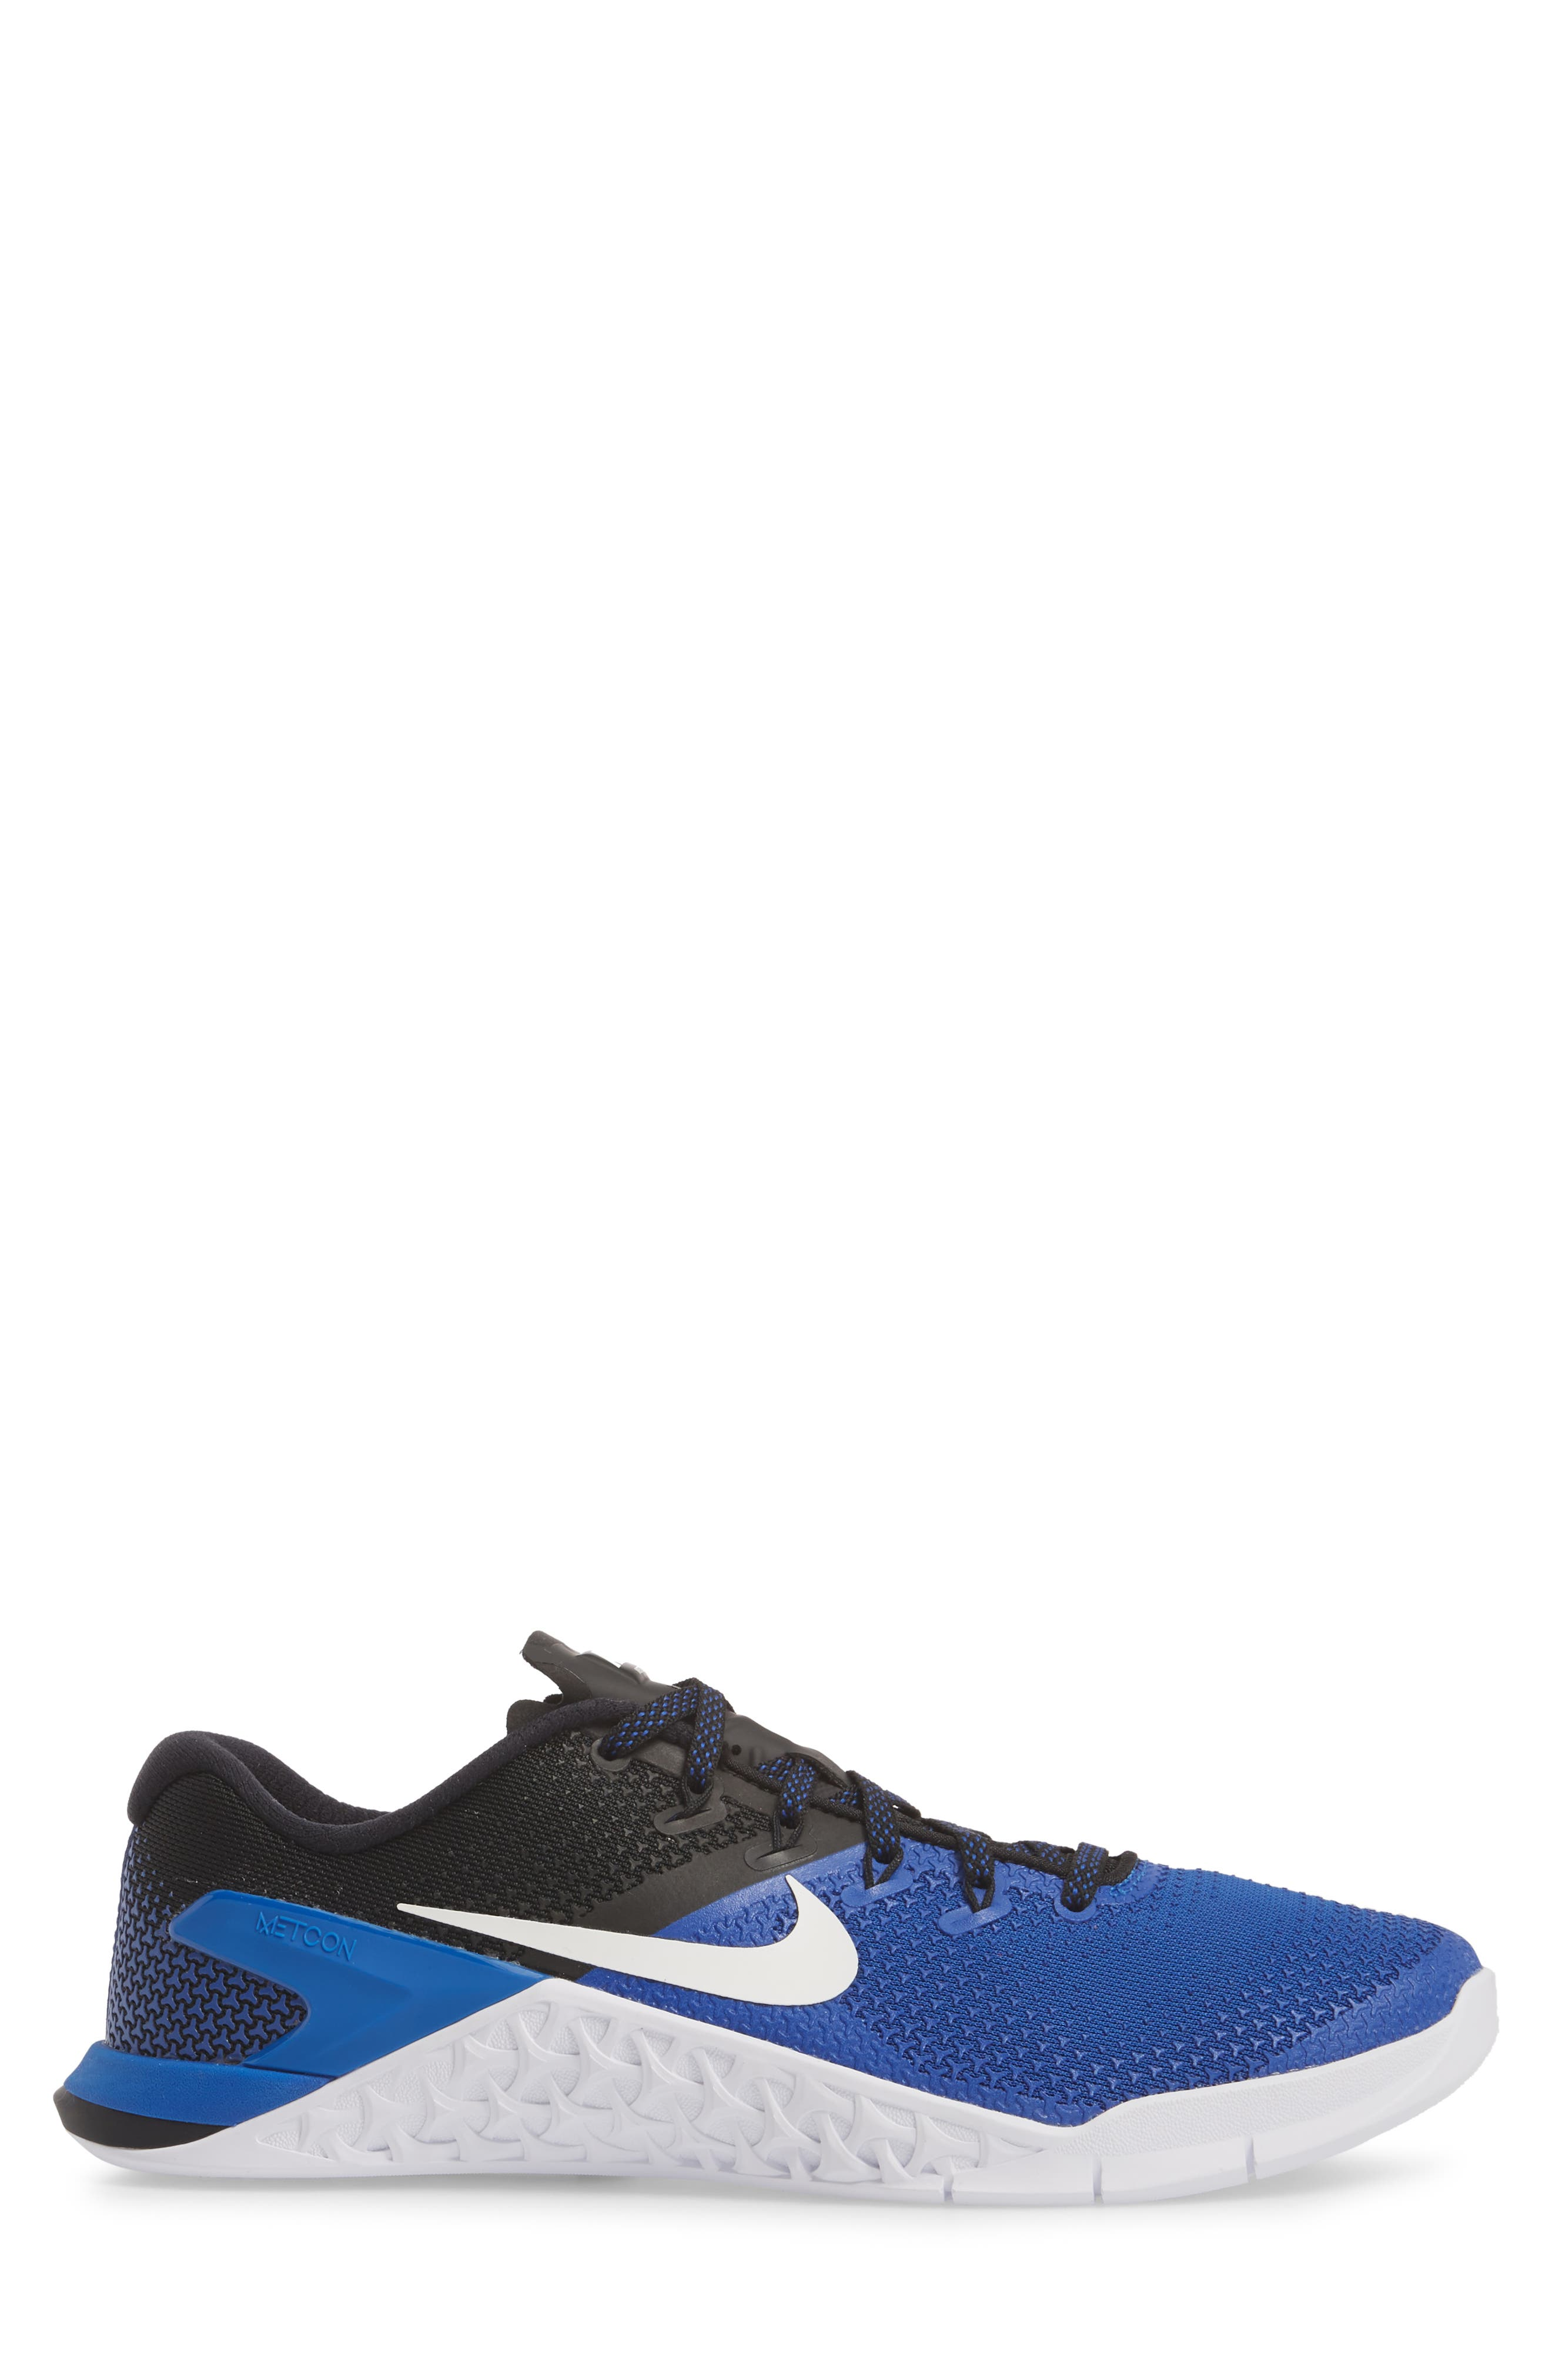 Metcon 4 Training Shoe,                             Alternate thumbnail 3, color,                             410